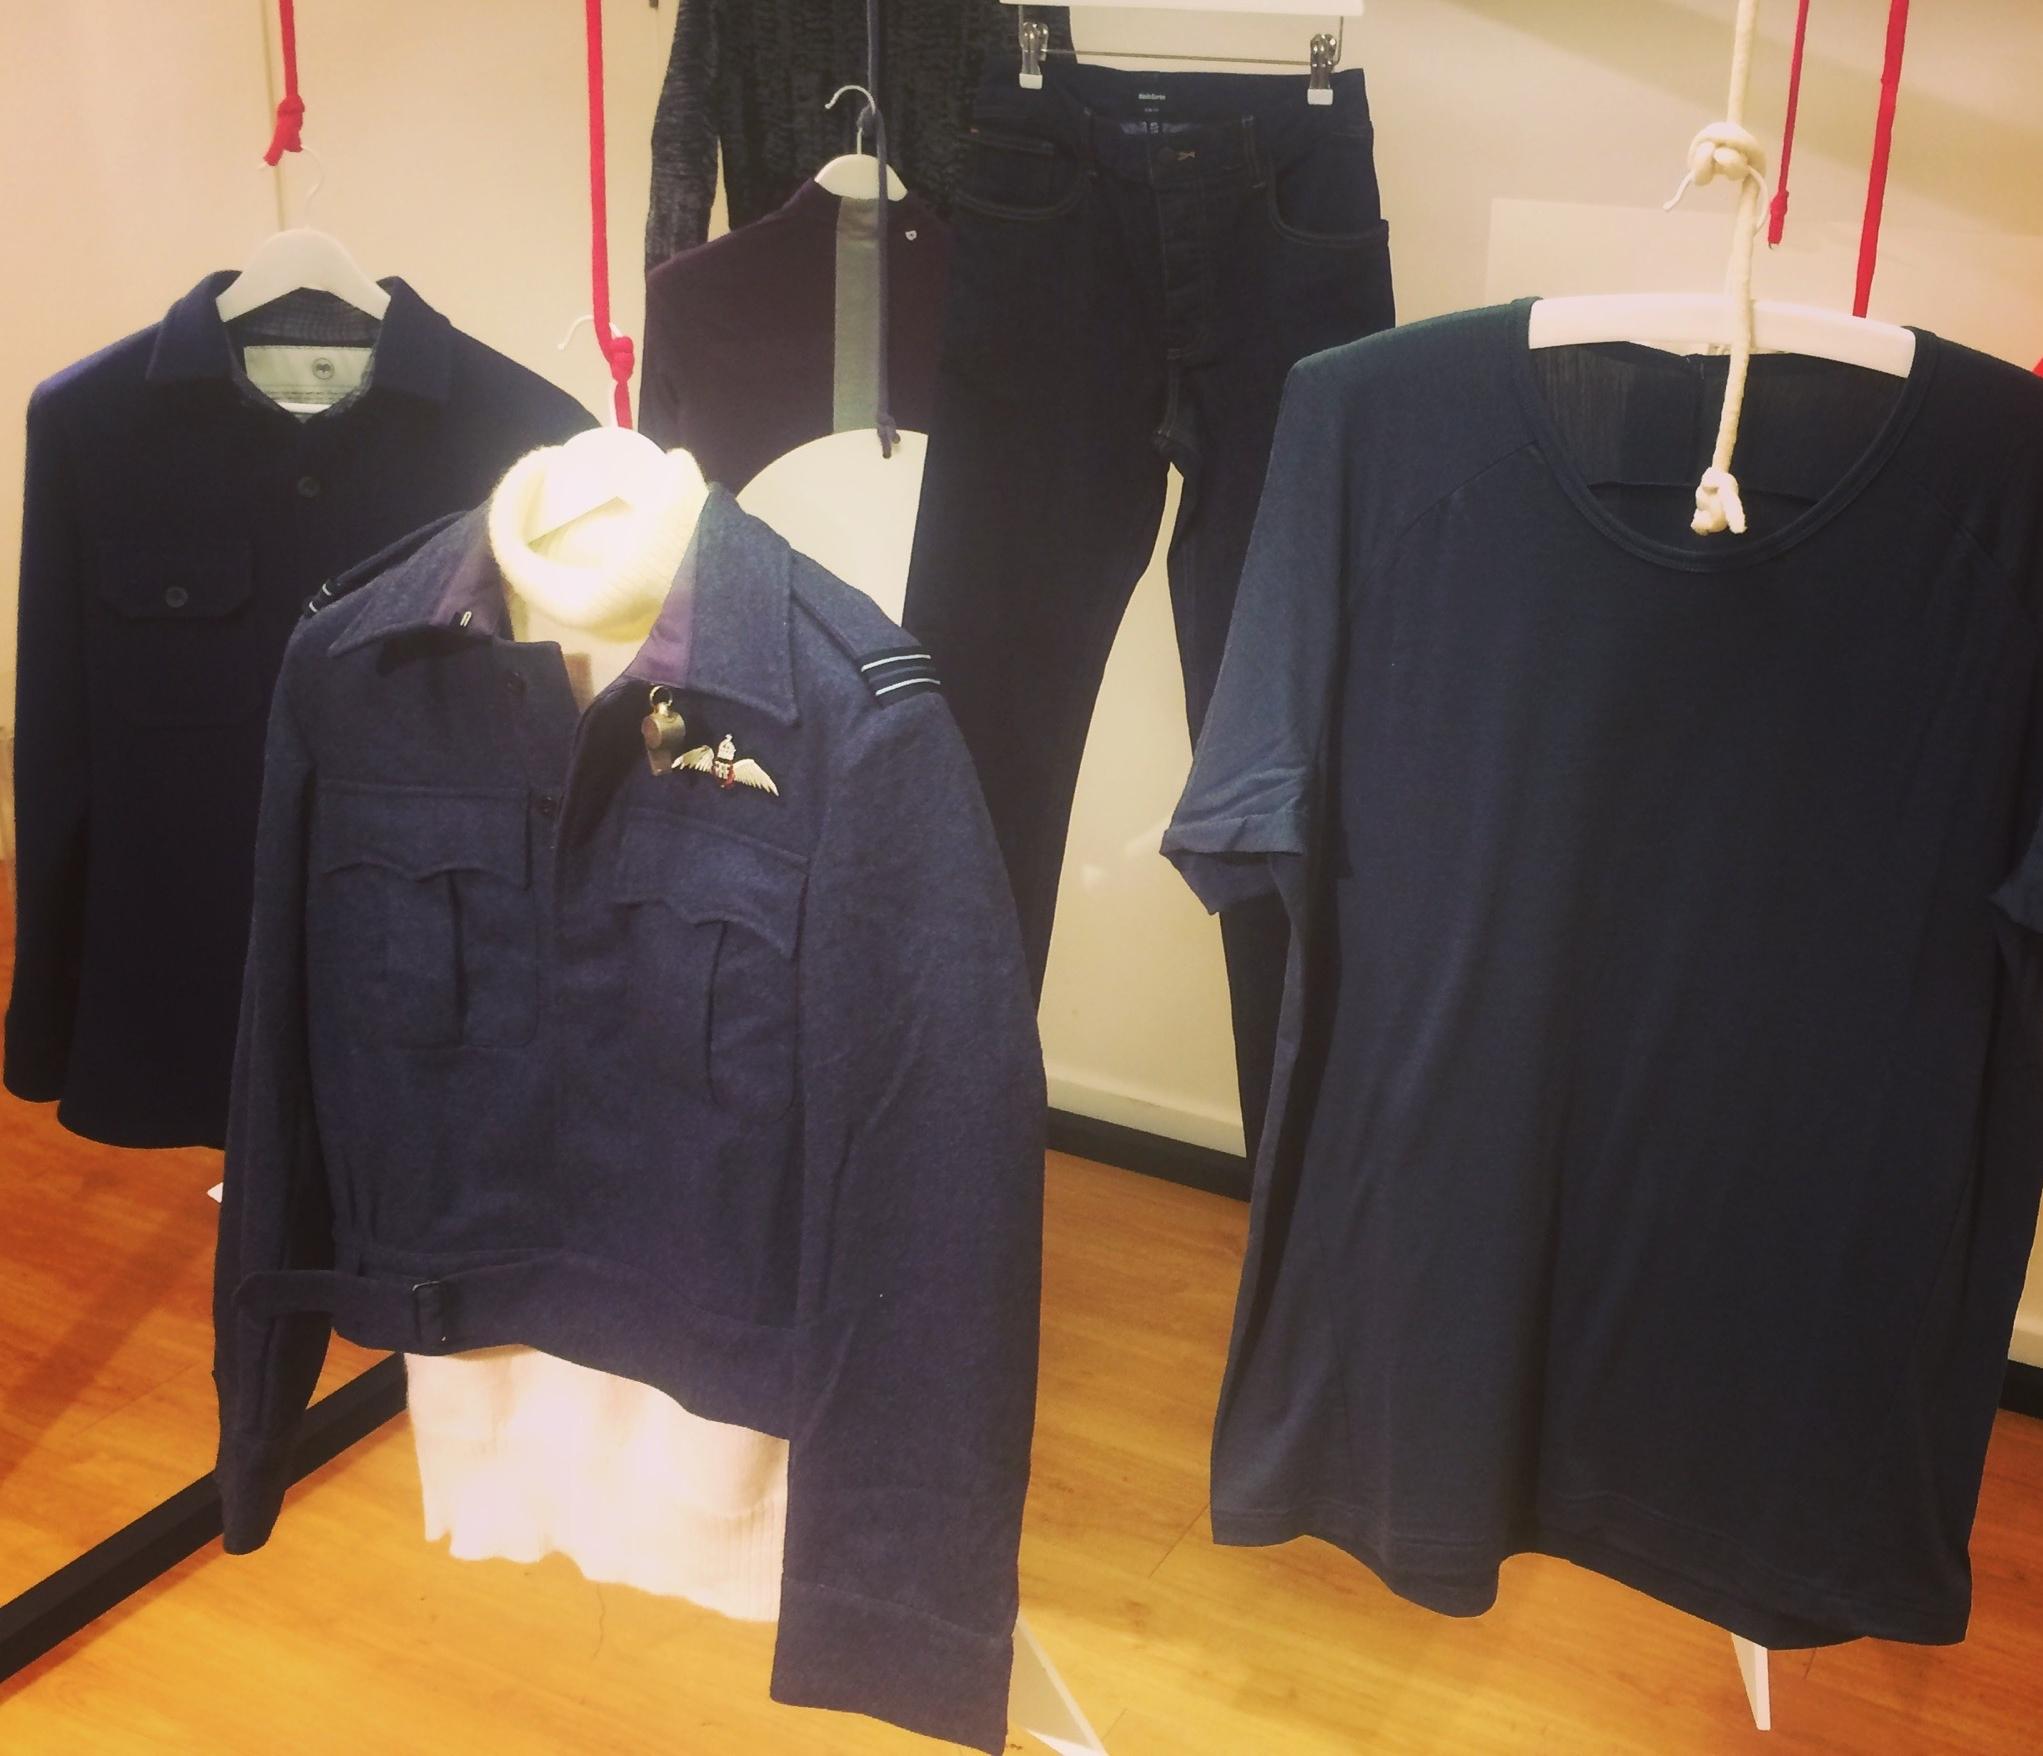 Vintage RAF pilot's wool battle-dress hanging amongst cutting edge modern wool garments